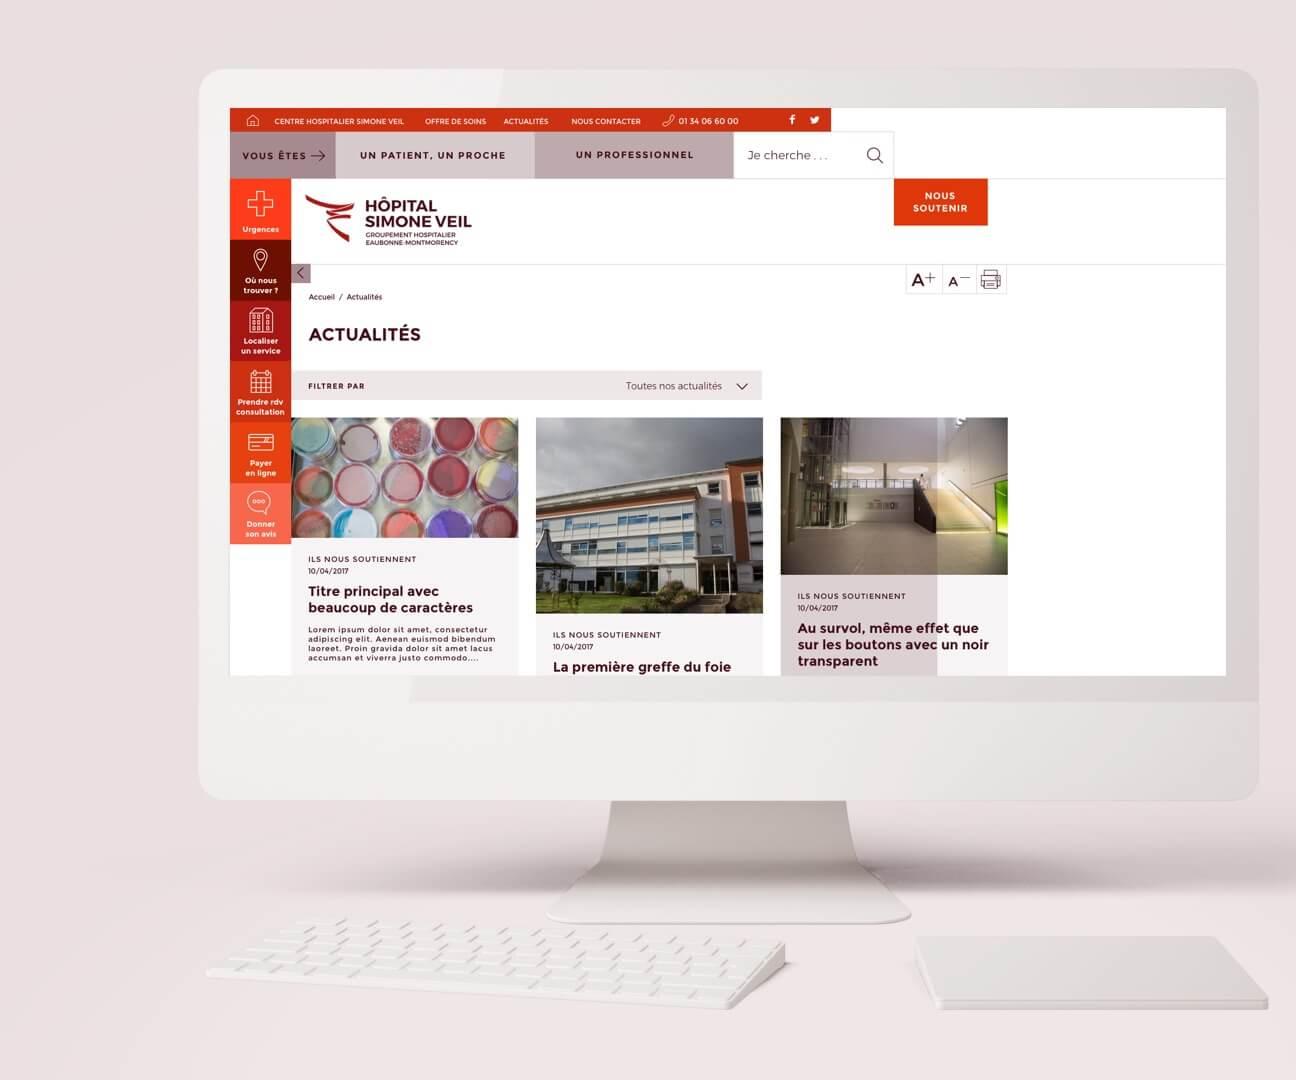 Webdesign hôpital : accueil